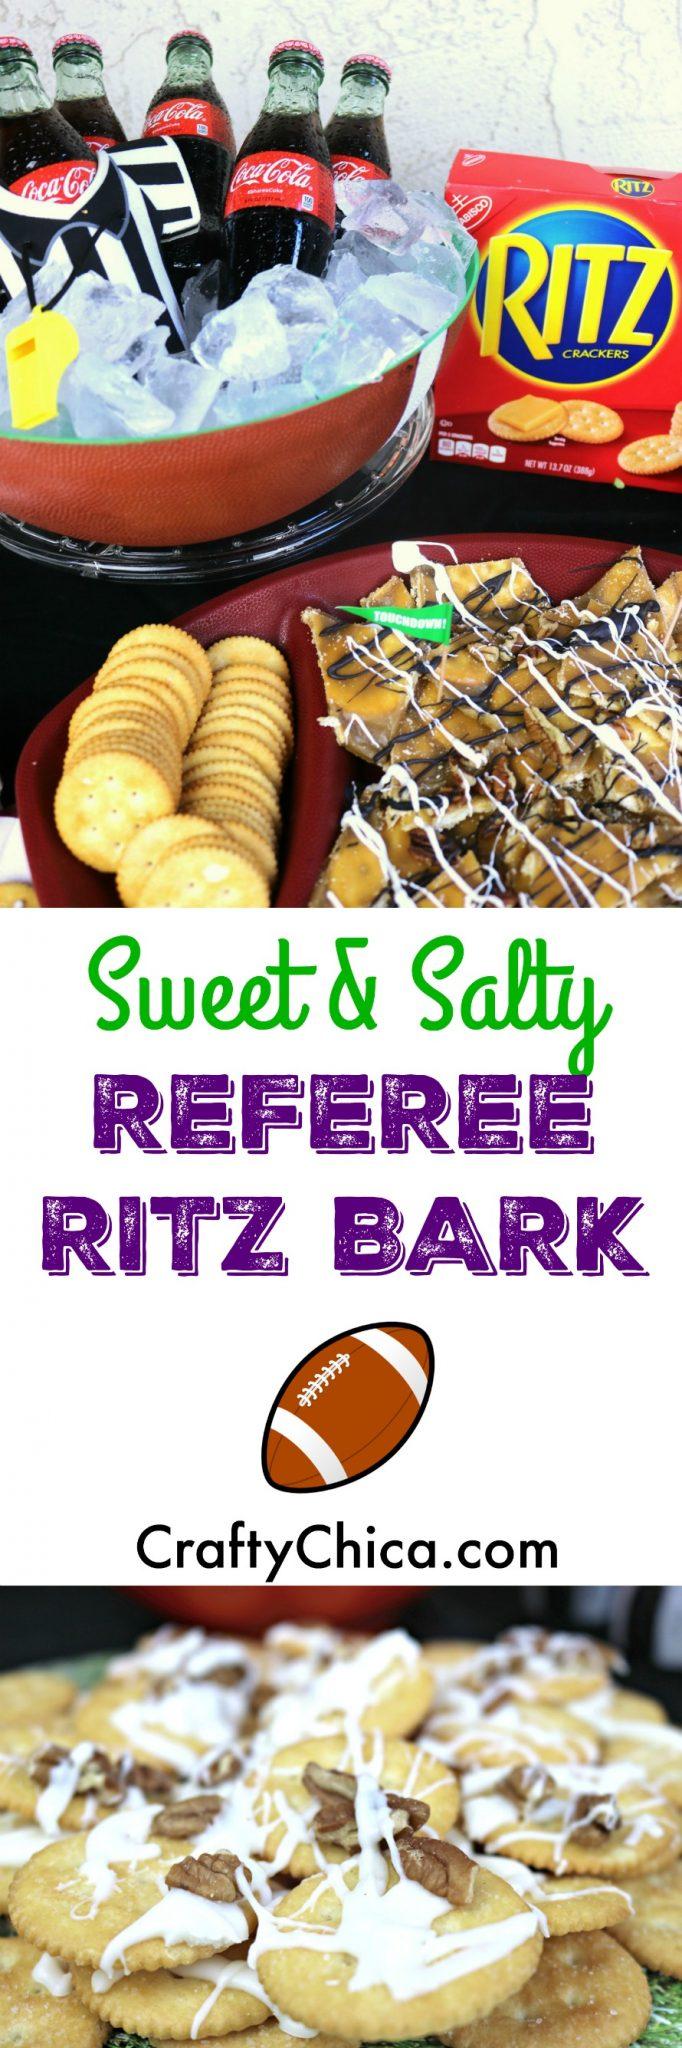 ritz-bark-coke